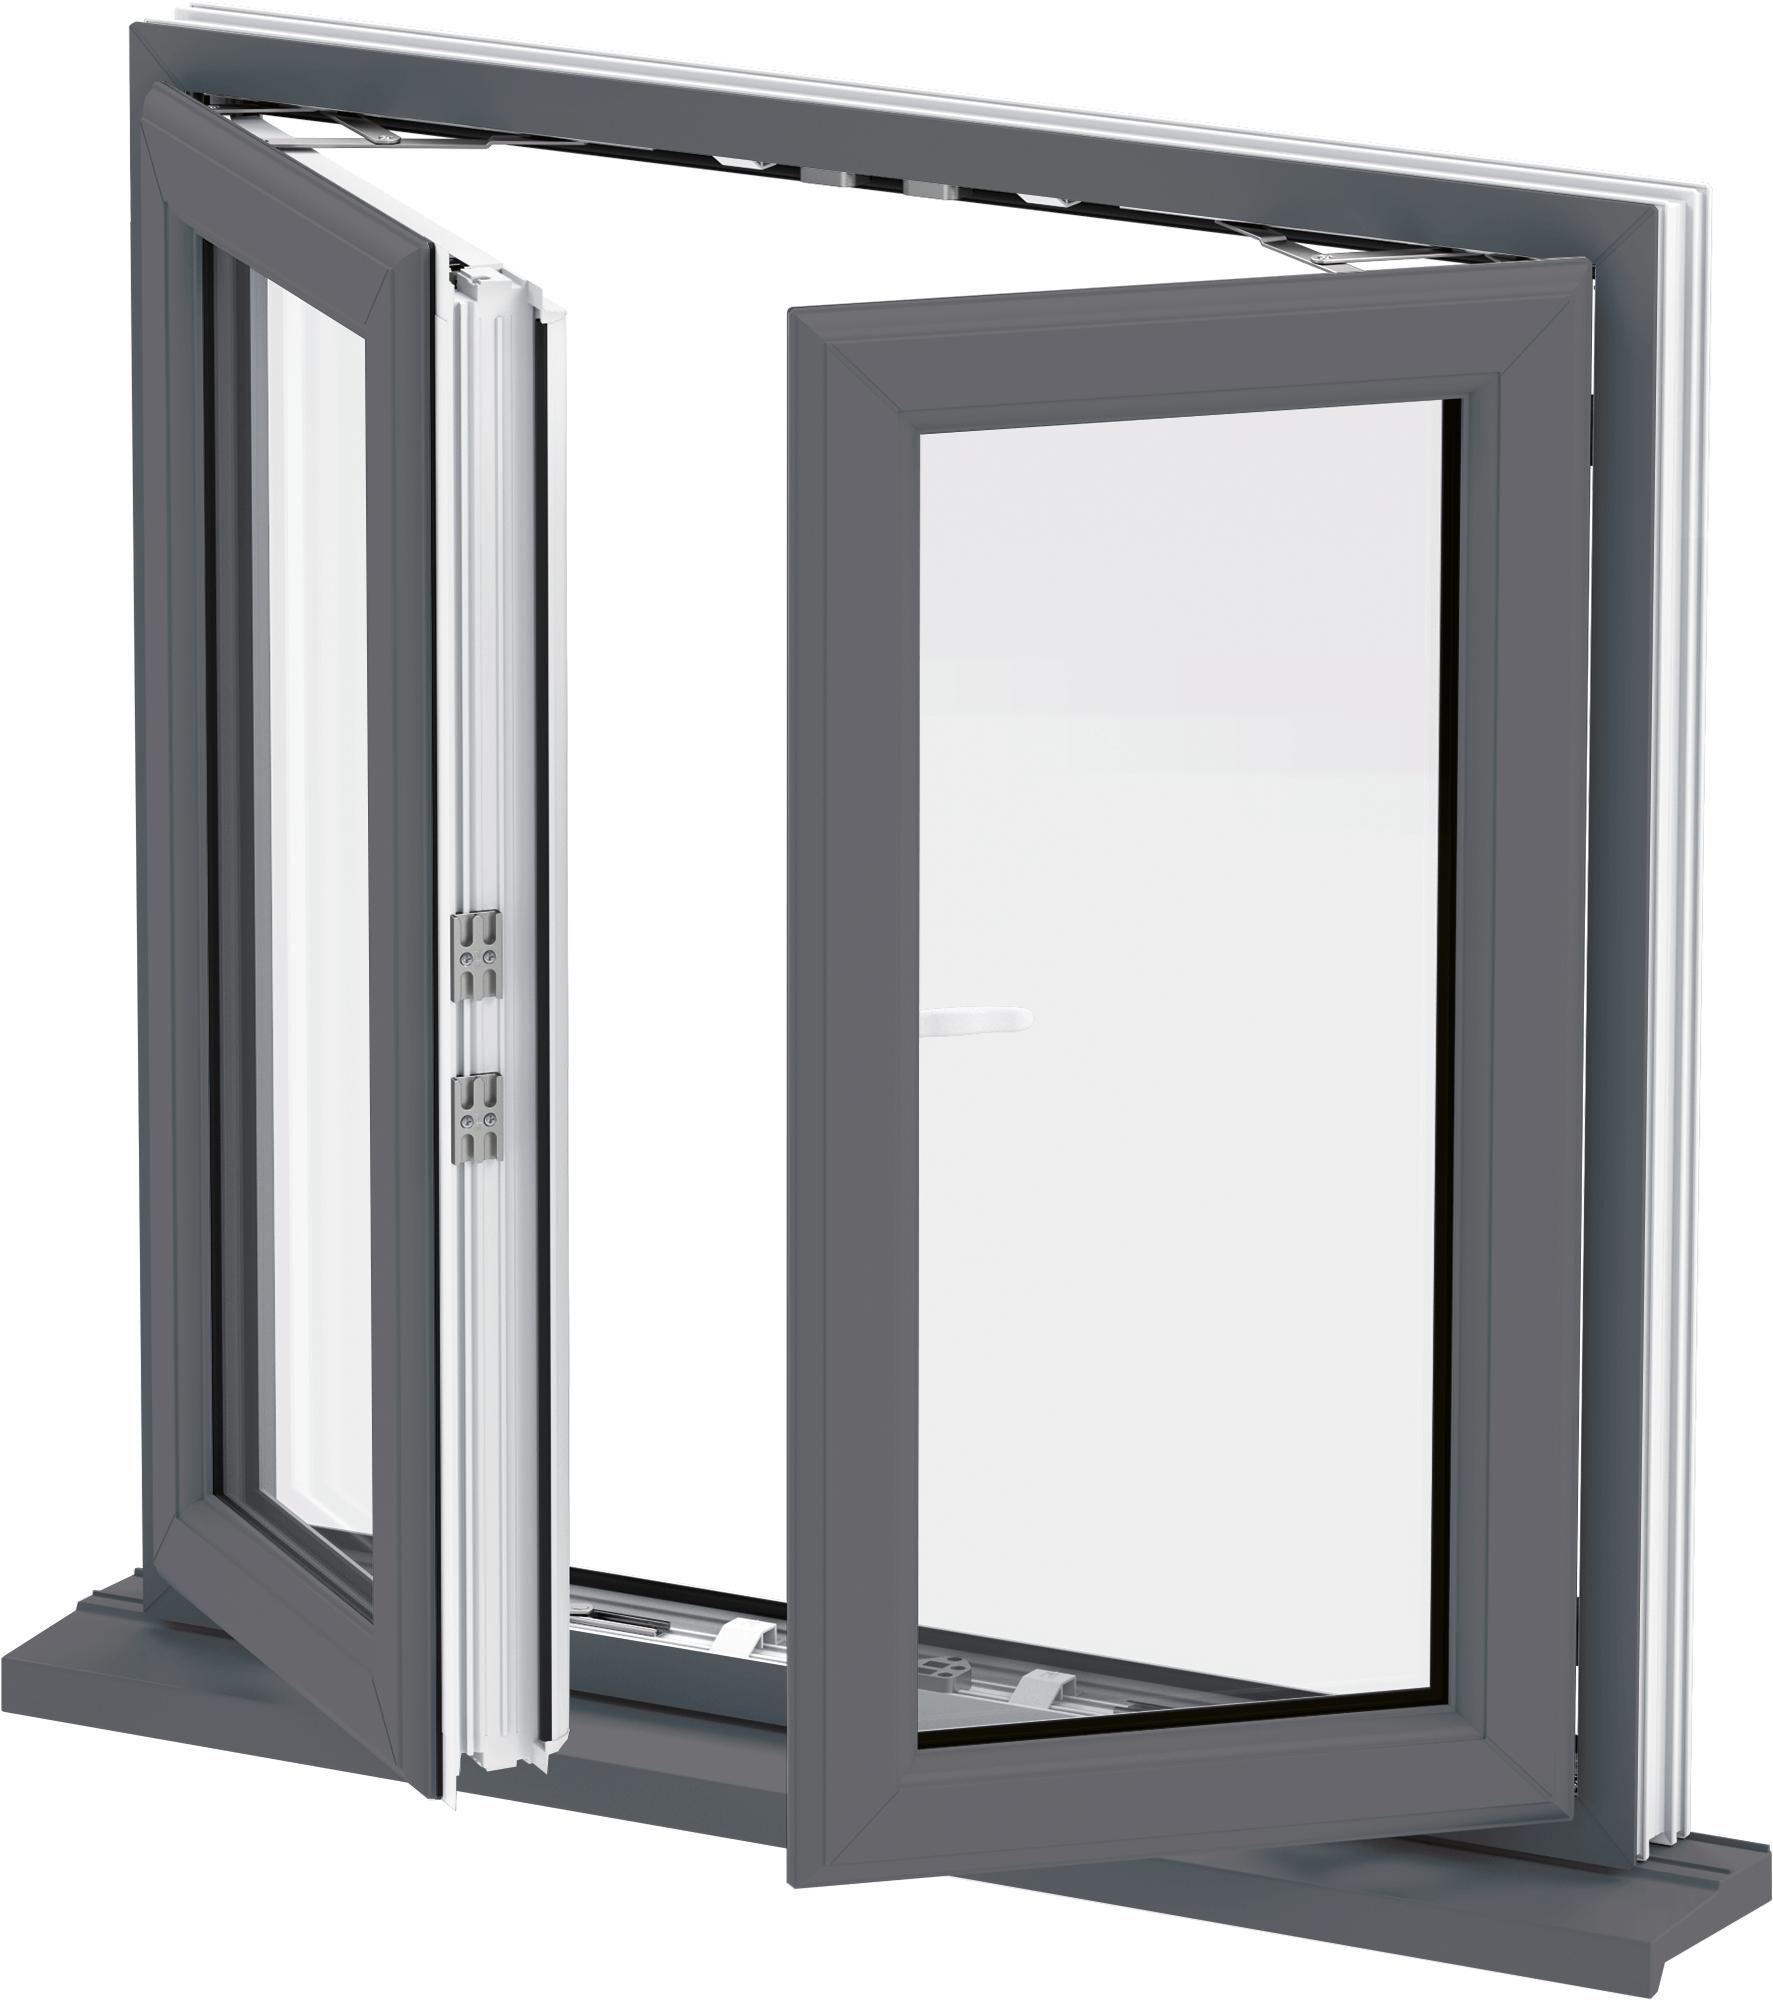 French casement windows - Upvc French Casement Windows